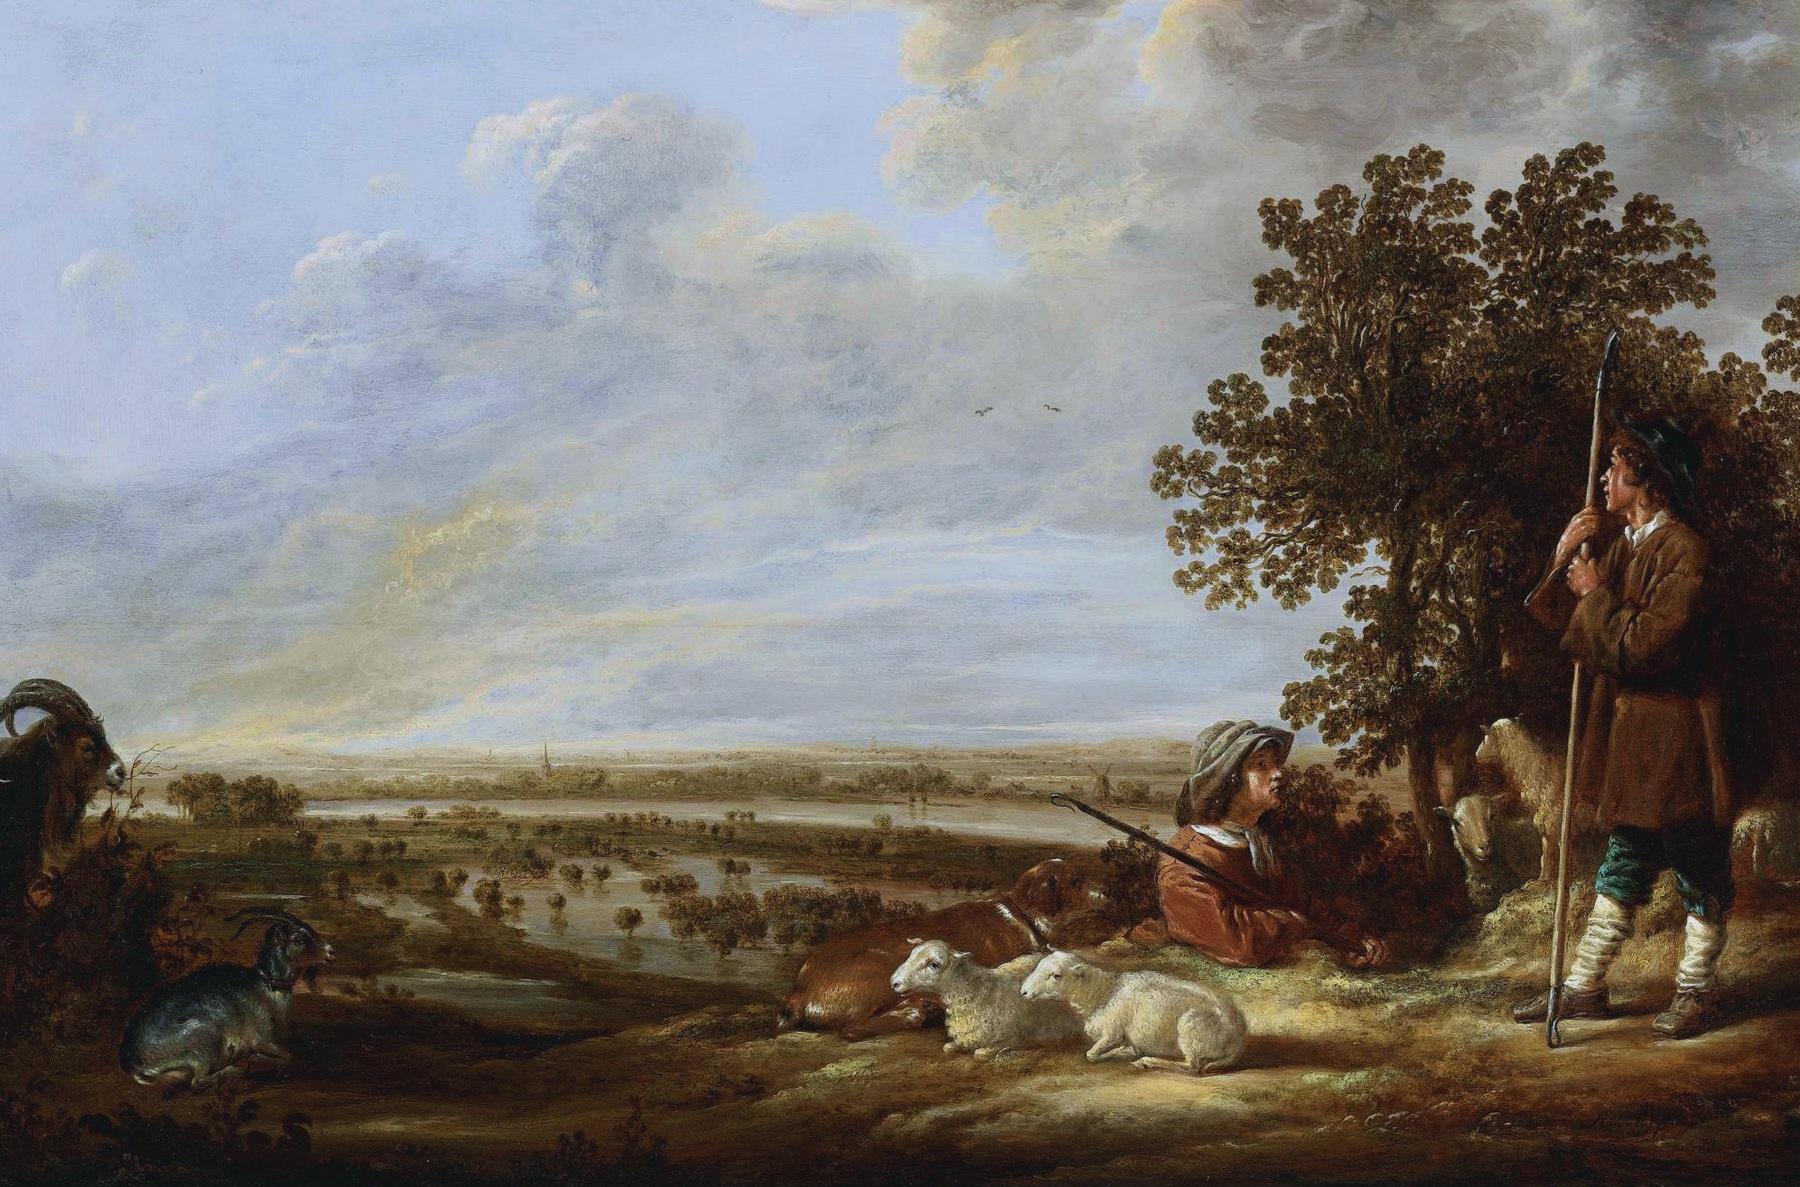 Verrassend File:Aelbert Cuyp - Landschap met twee herders en hun dieren.jpg JE-35